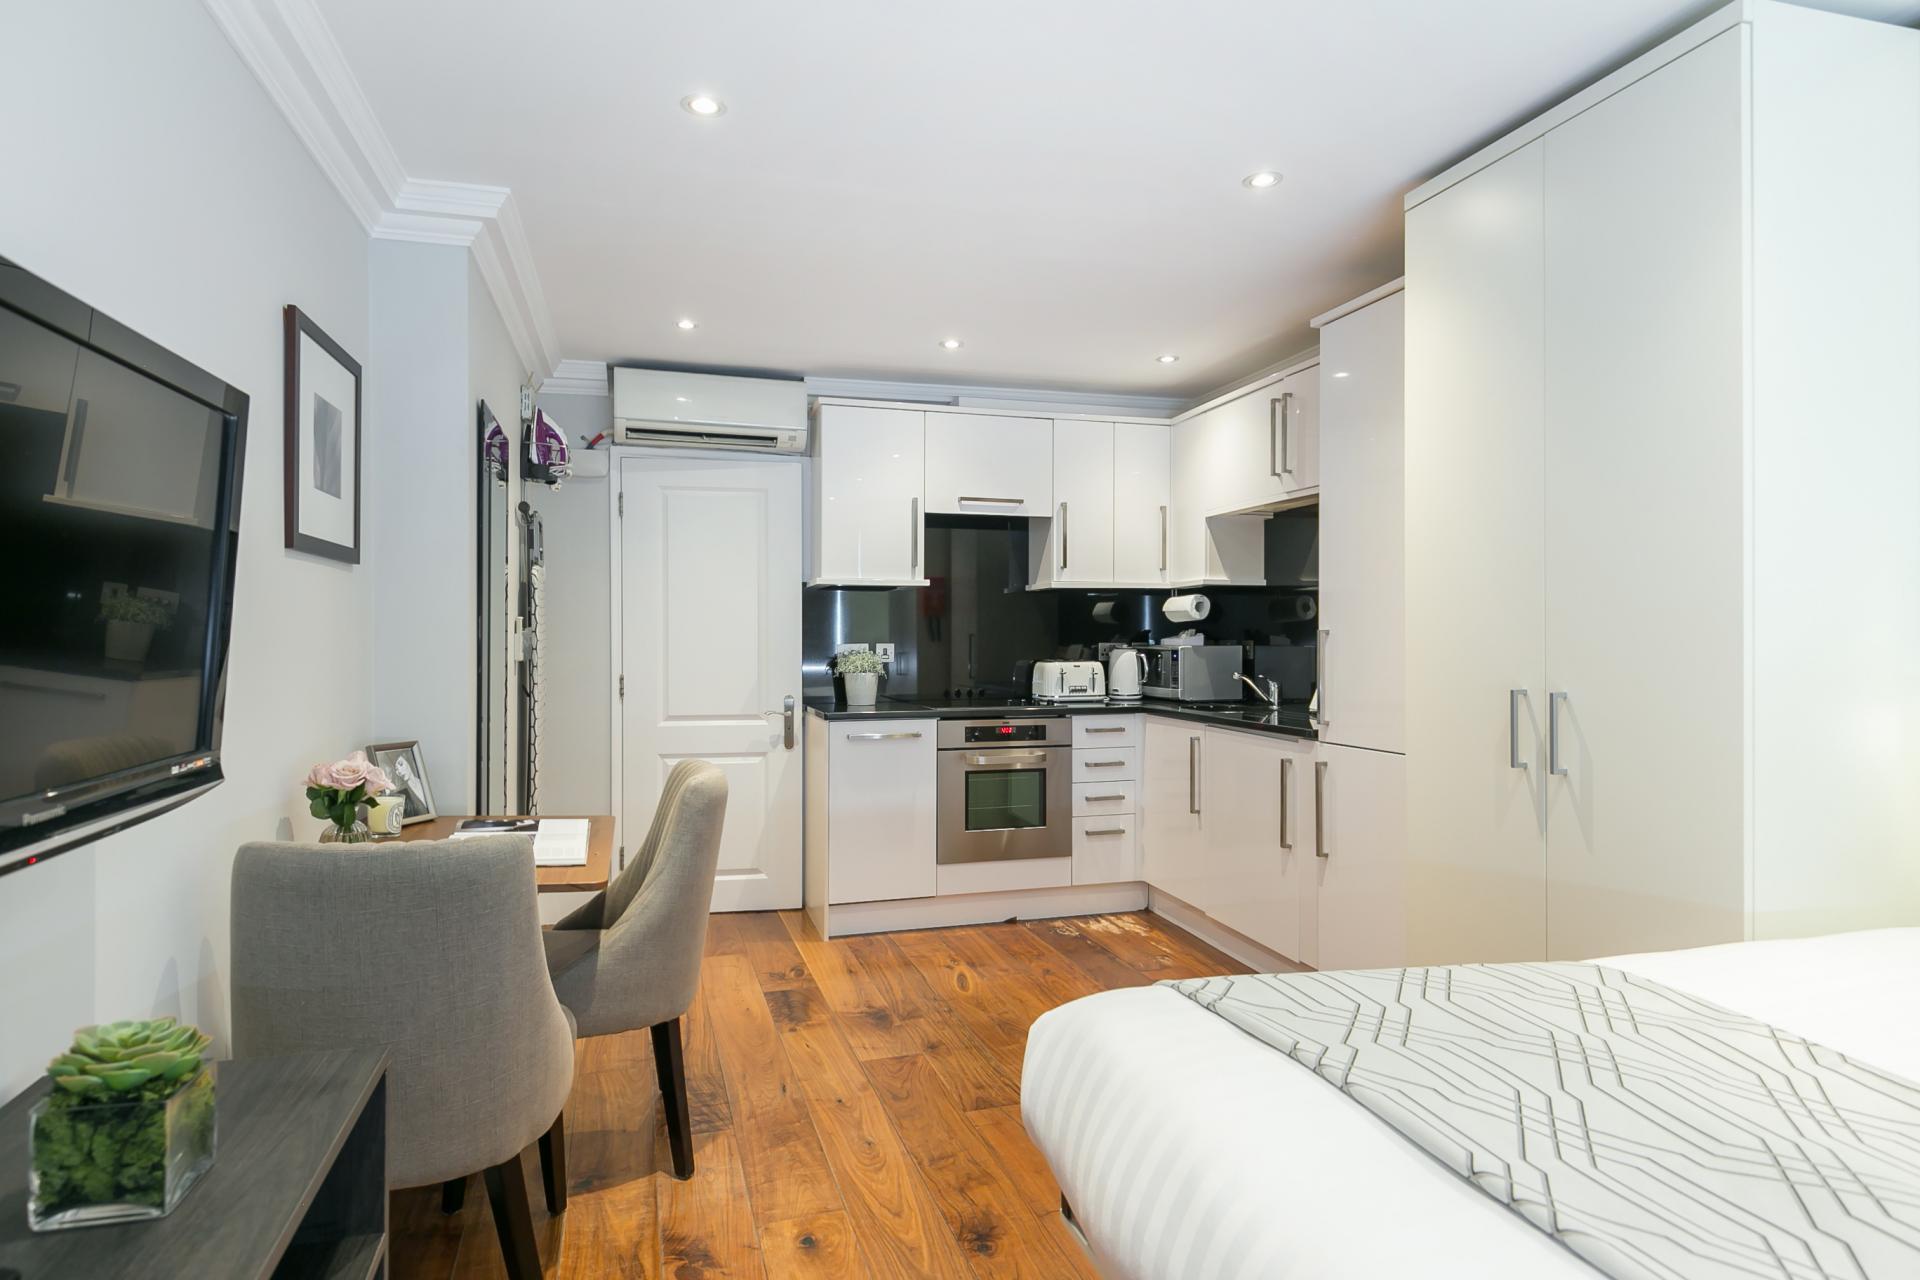 Kitchen diner at Chilworth Court Serviced Apartments, Paddington, London